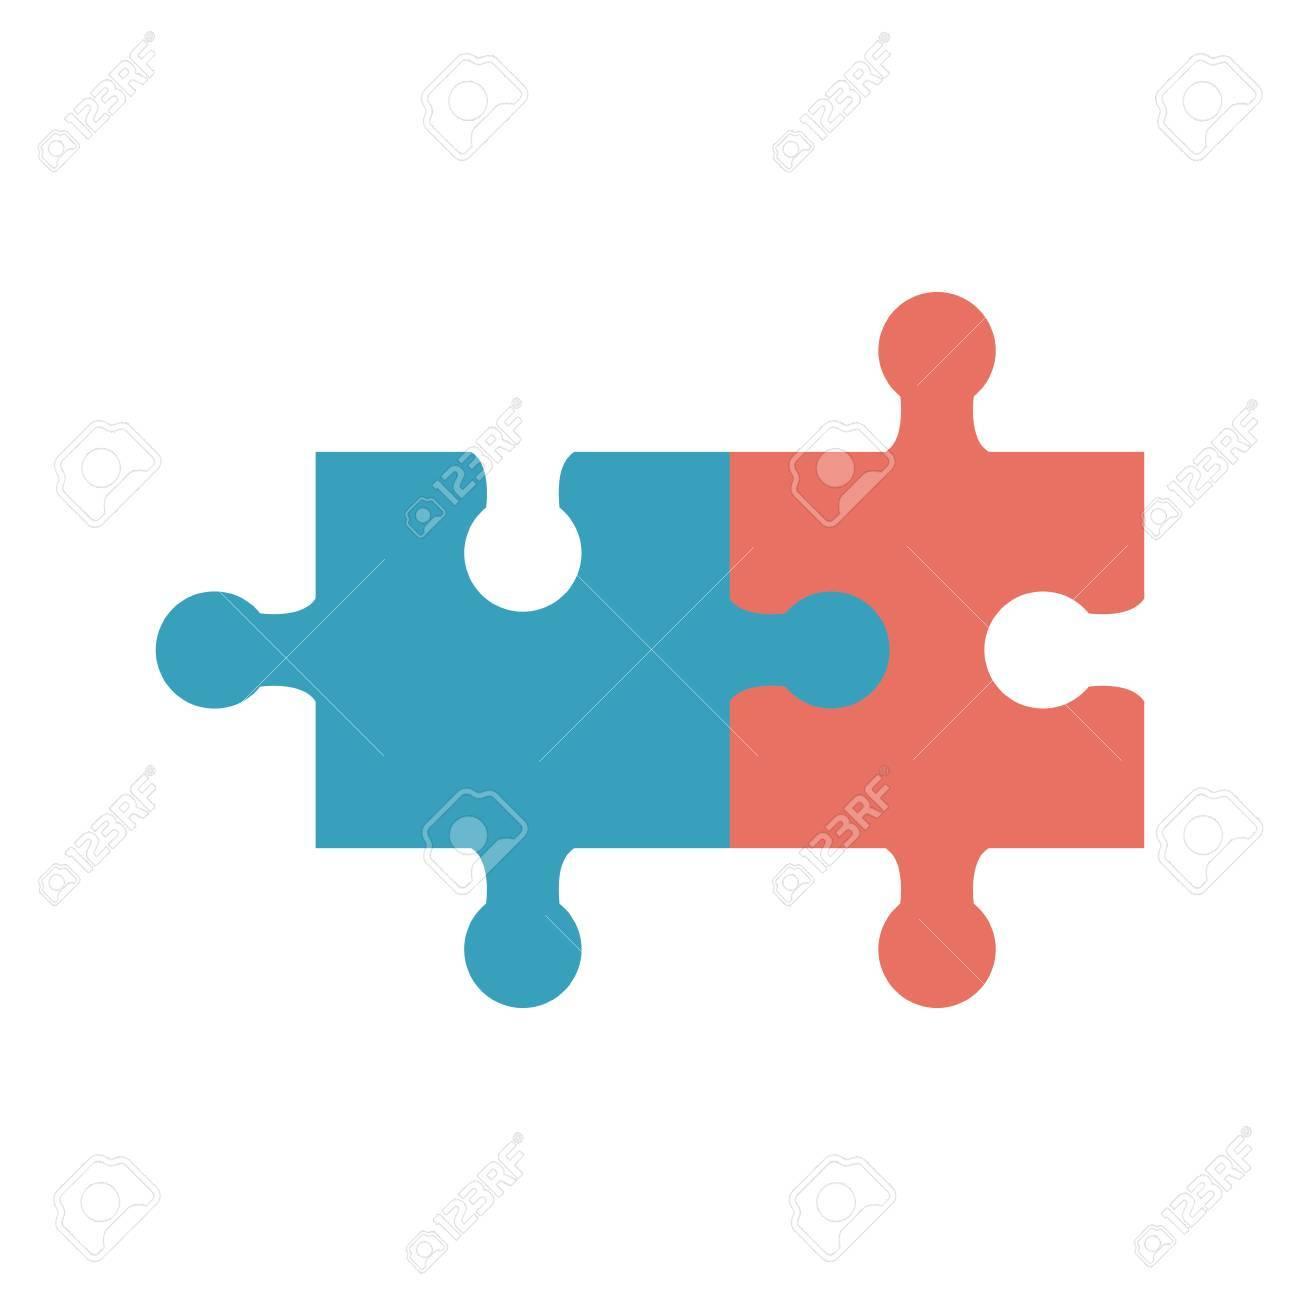 puzzle pieces icon image vector illustration design royalty free rh 123rf com puzzle pieces vector file puzzle piece vector shape